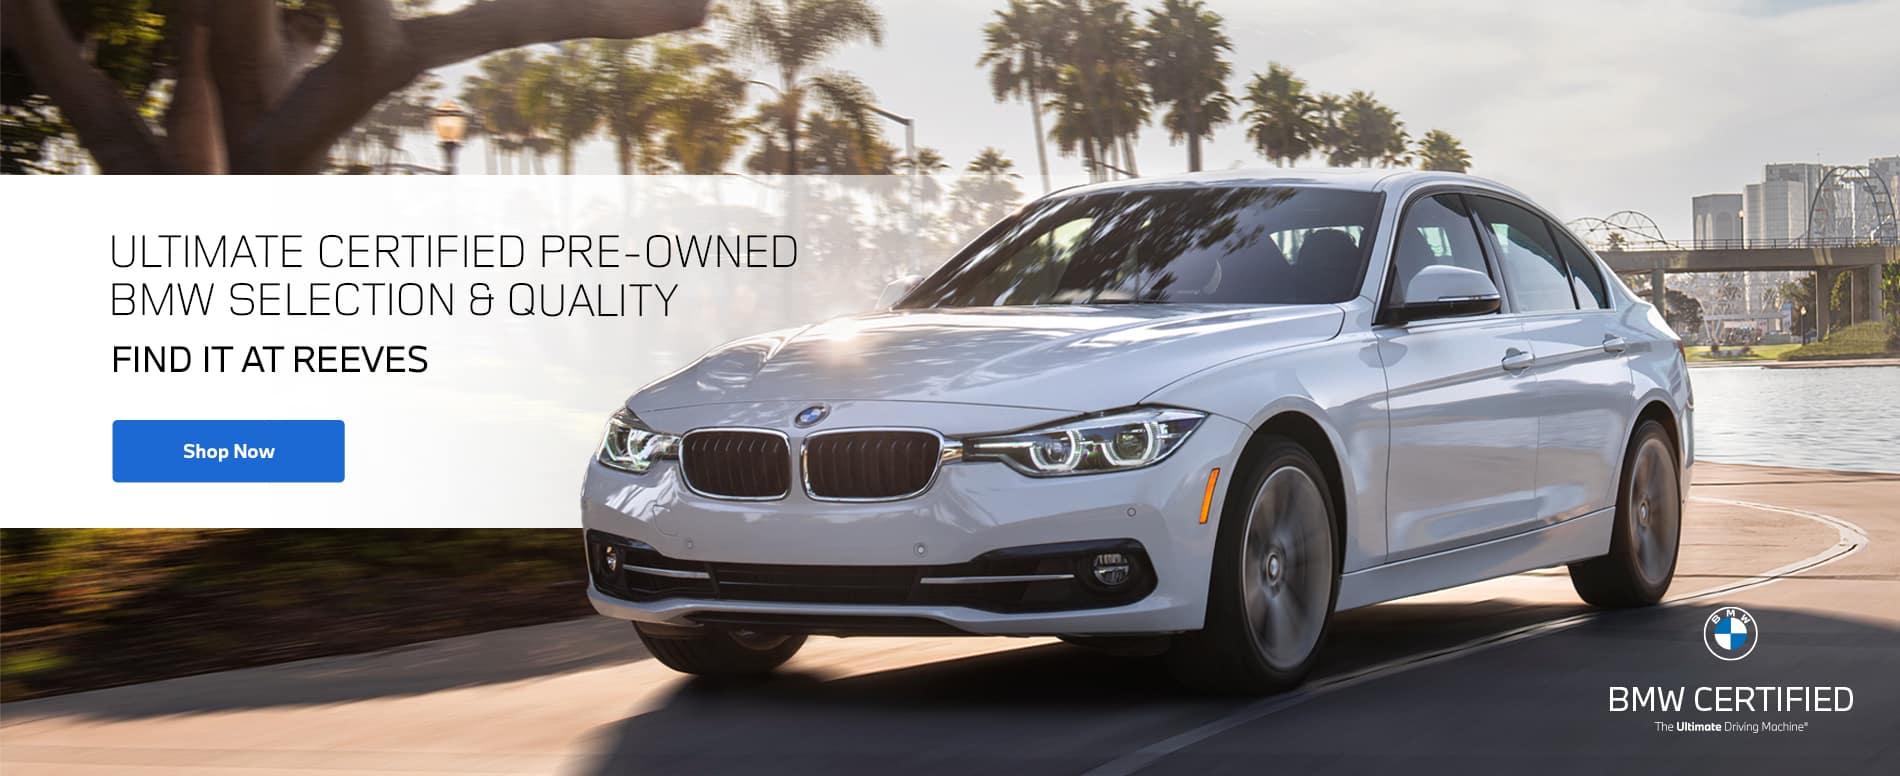 BMW-3series-Lease-August-Webslide-alt1 (1)